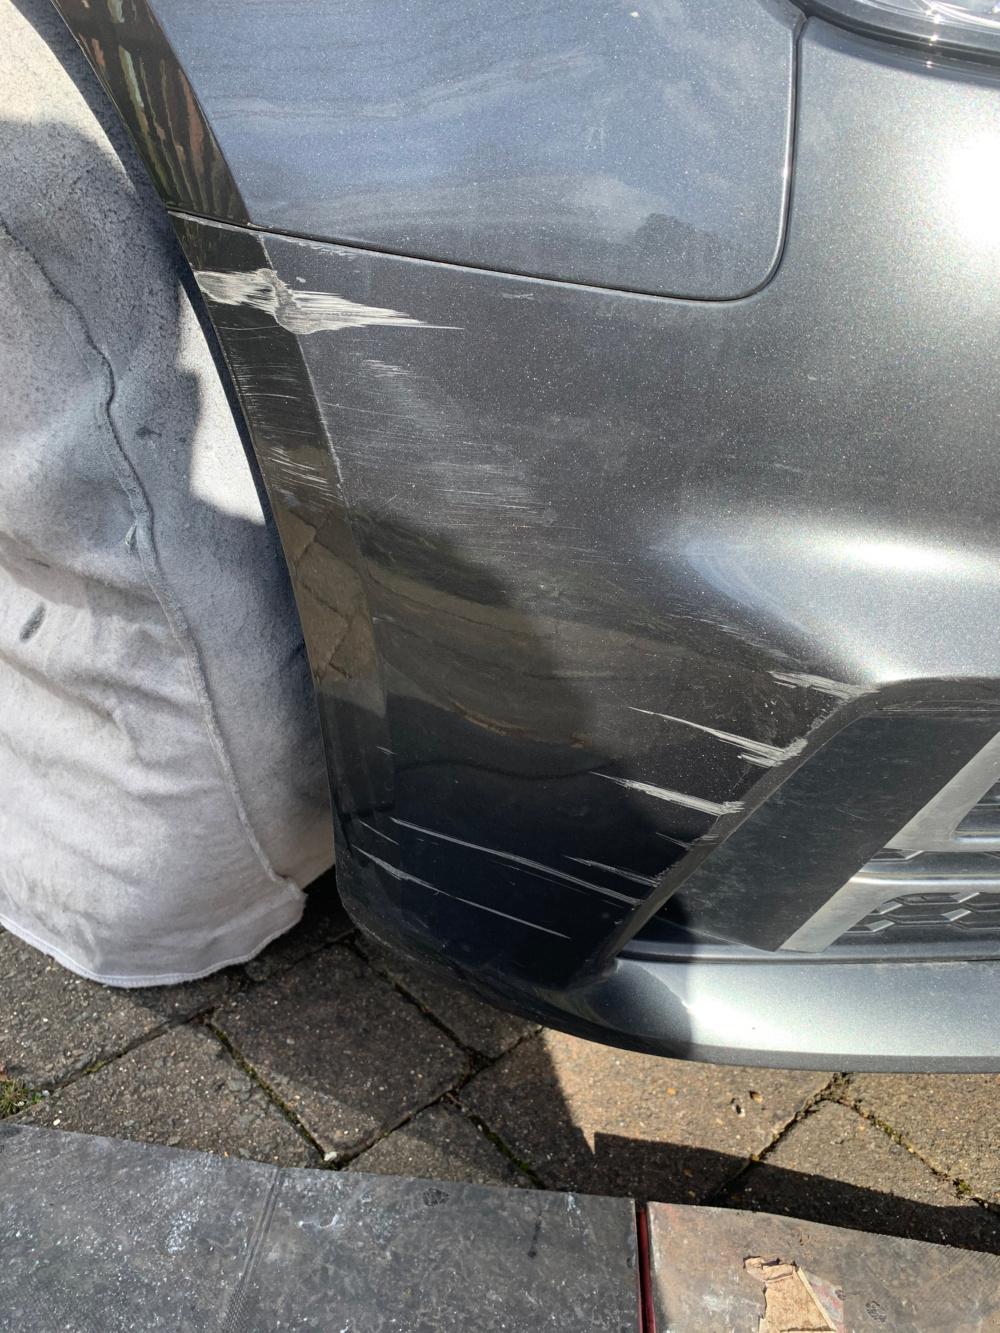 scuff marks on bumper before repair